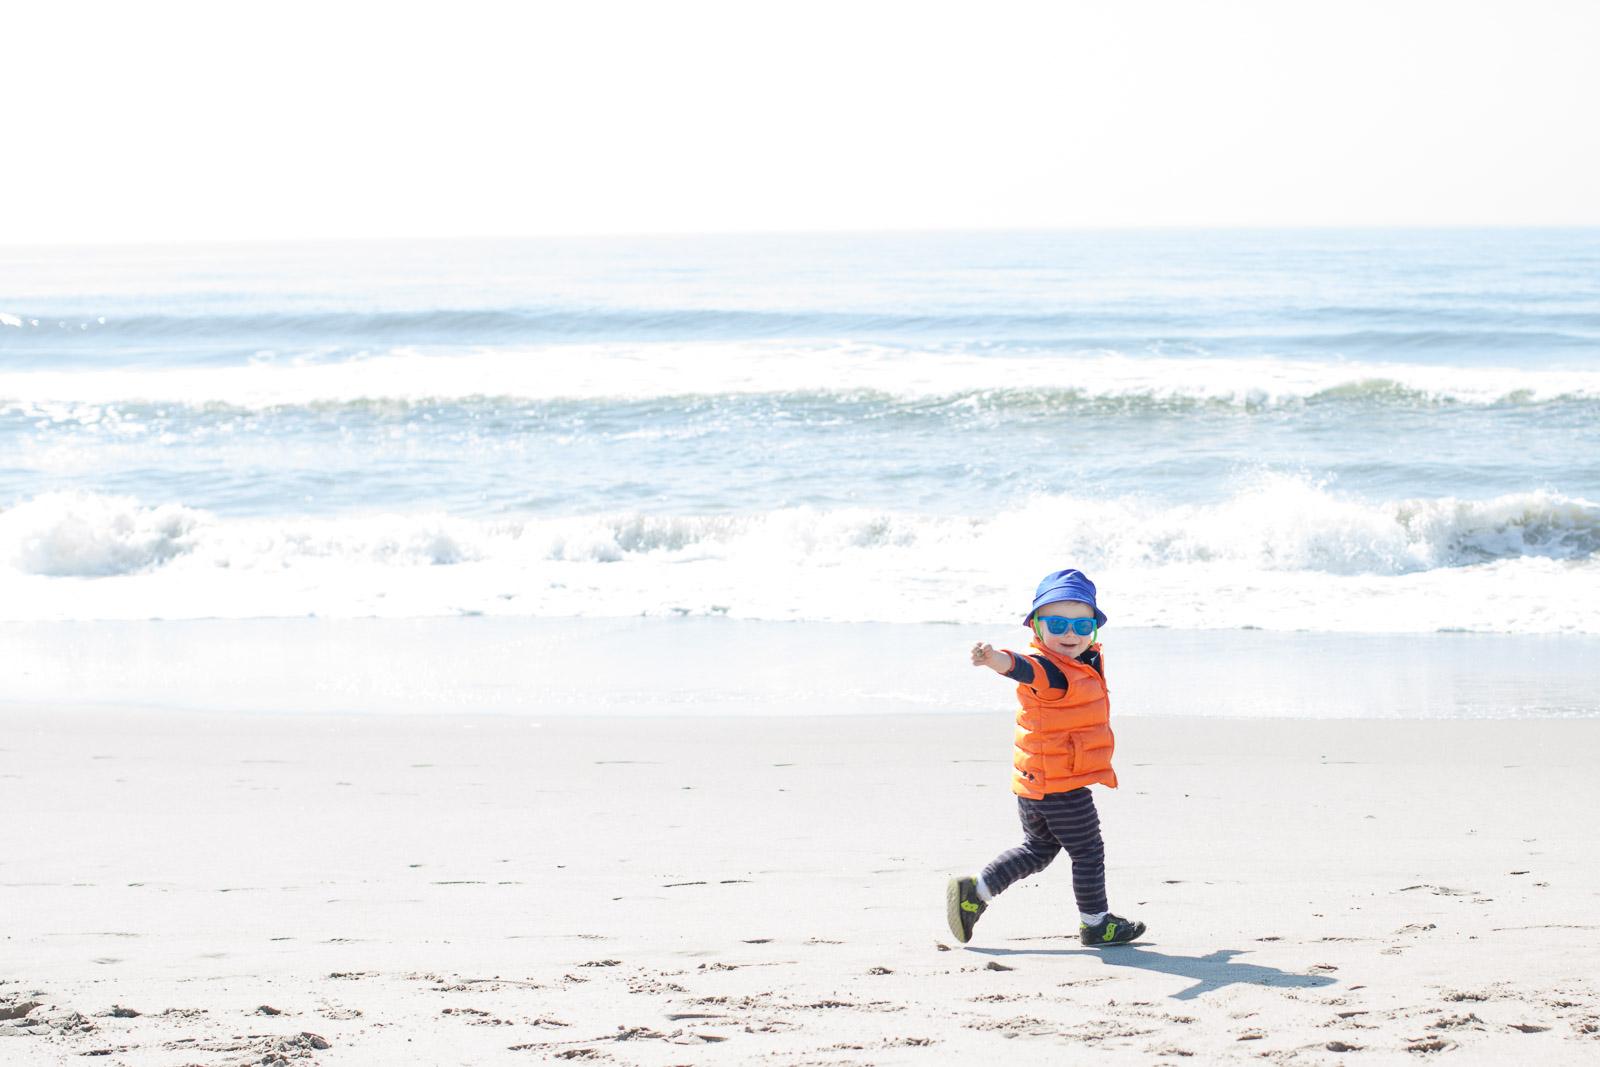 rockaway-beach-april-2015-2-robertiaga-4